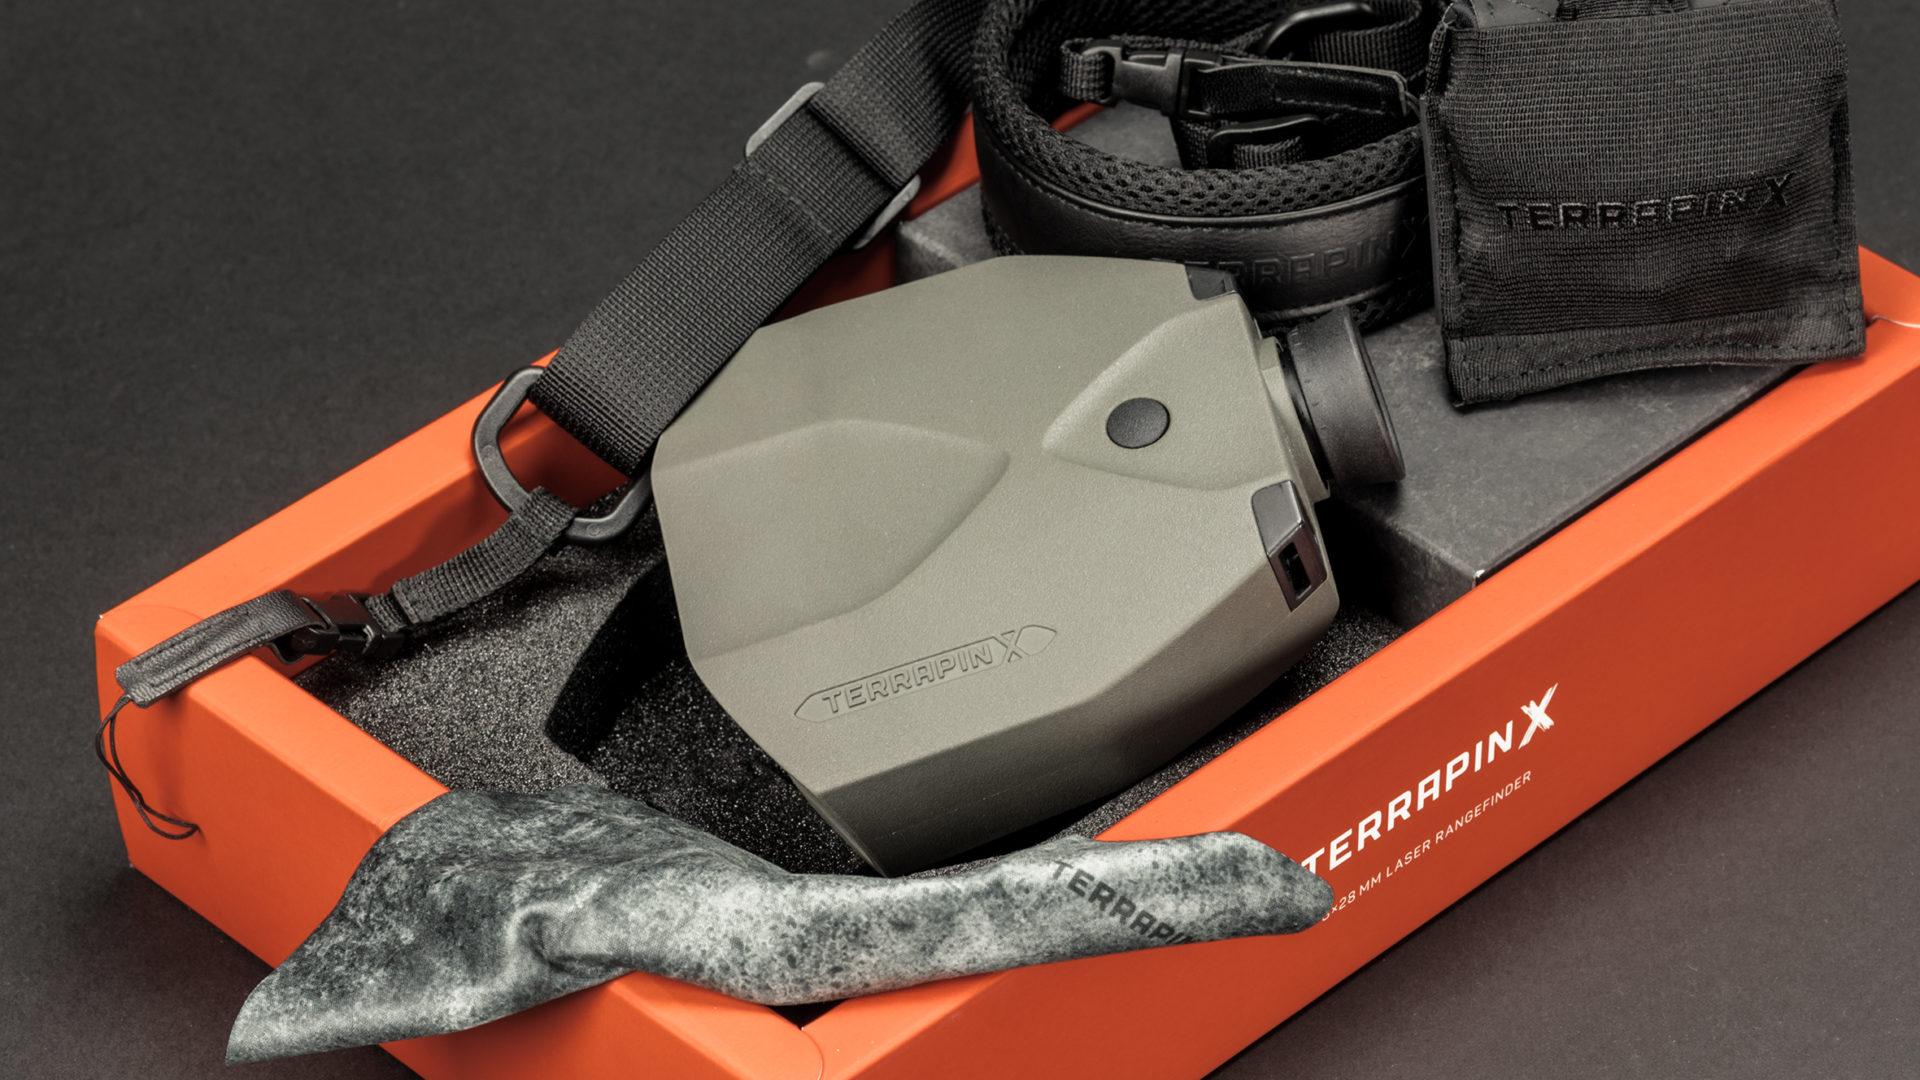 Laser Entfernungsmesser Vectronix : Iea vectronix terrapinx